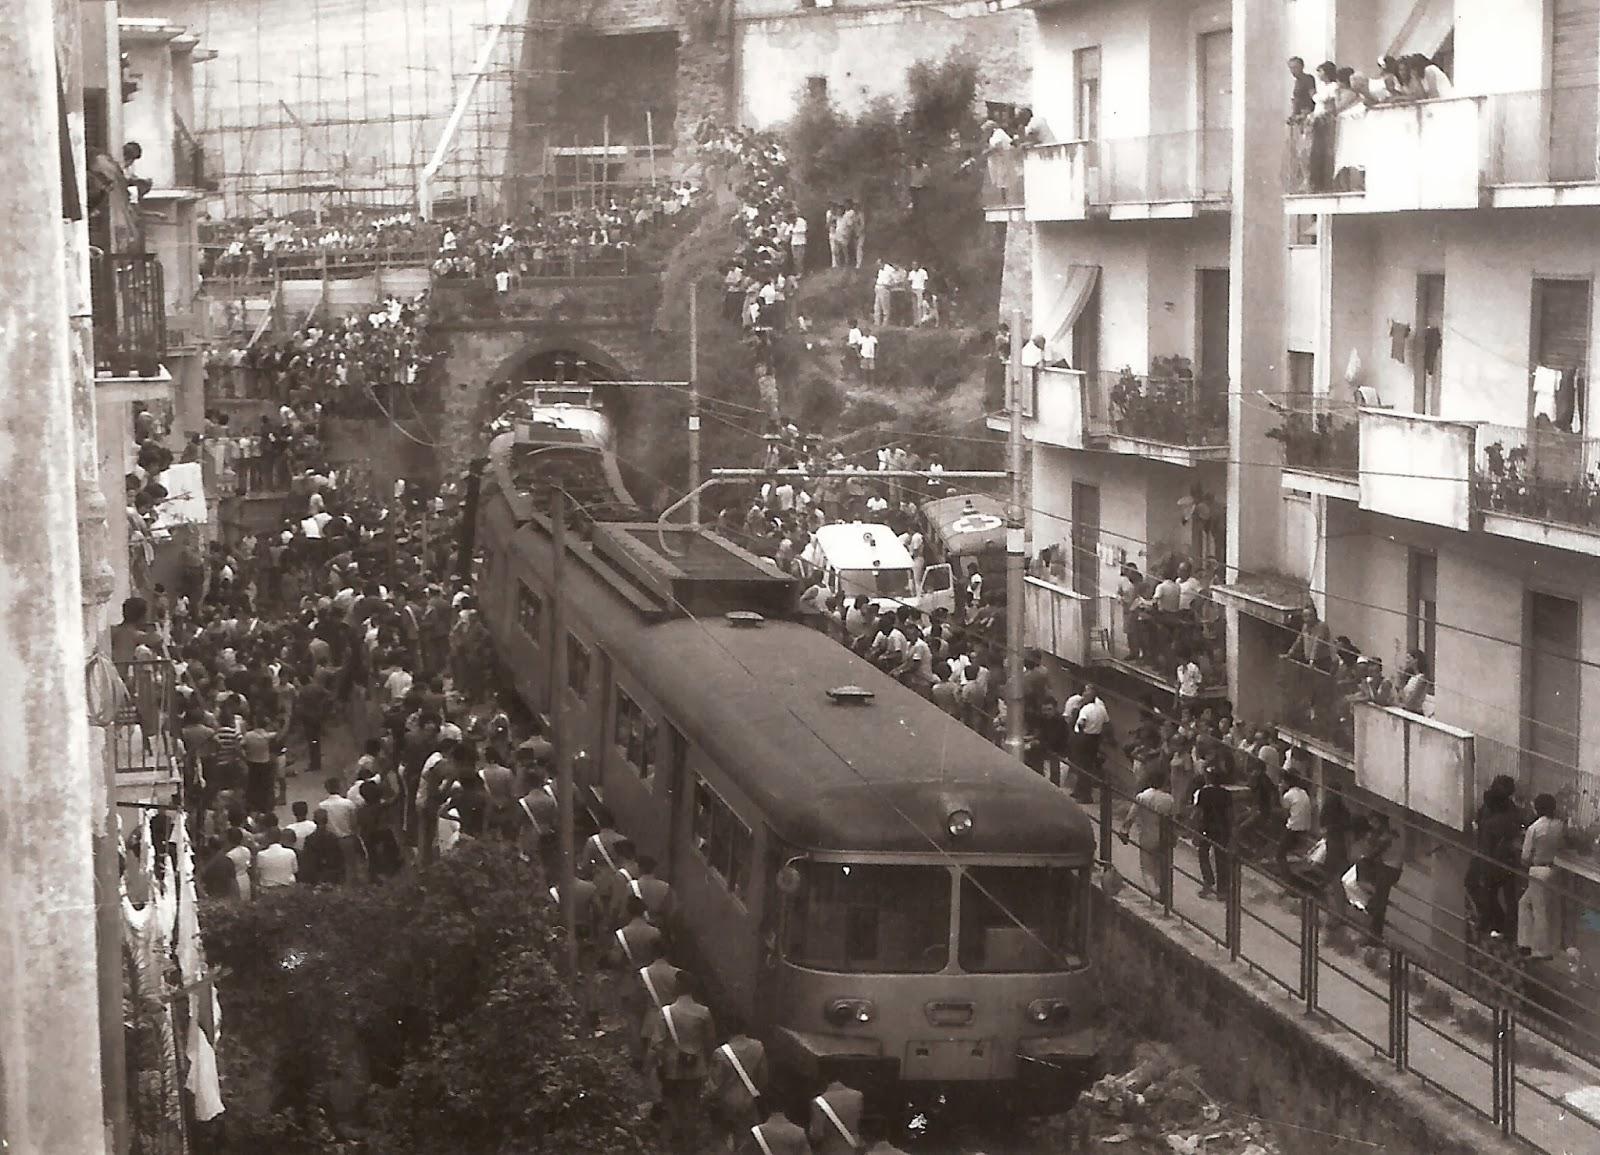 Cumana, quarantadue anni fa, 7 morti e decine di feriti